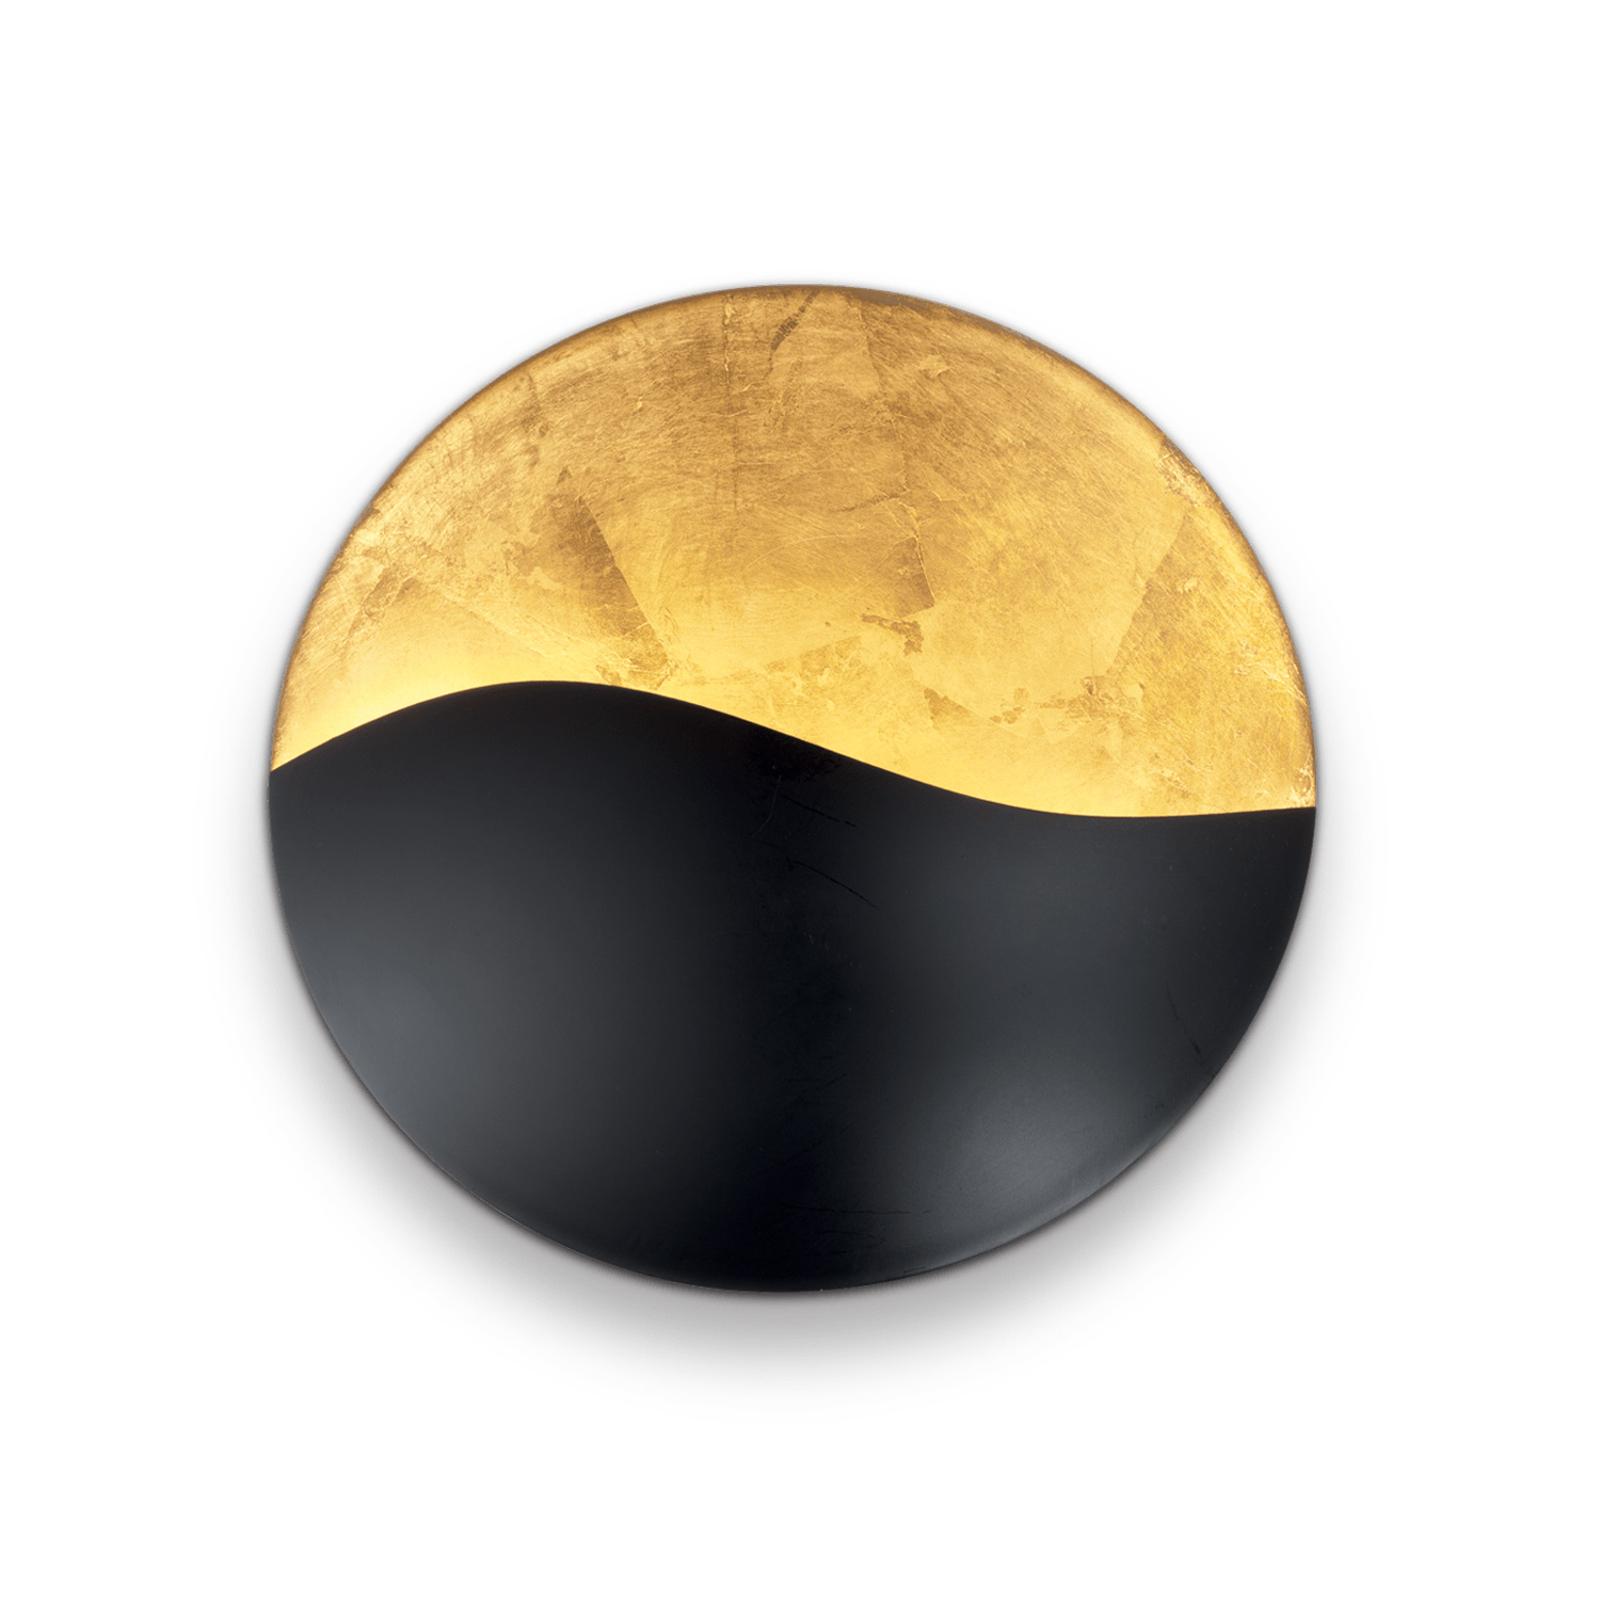 Wandlamp Sunrise G9, zwart / goud, Ø 27,5 cm